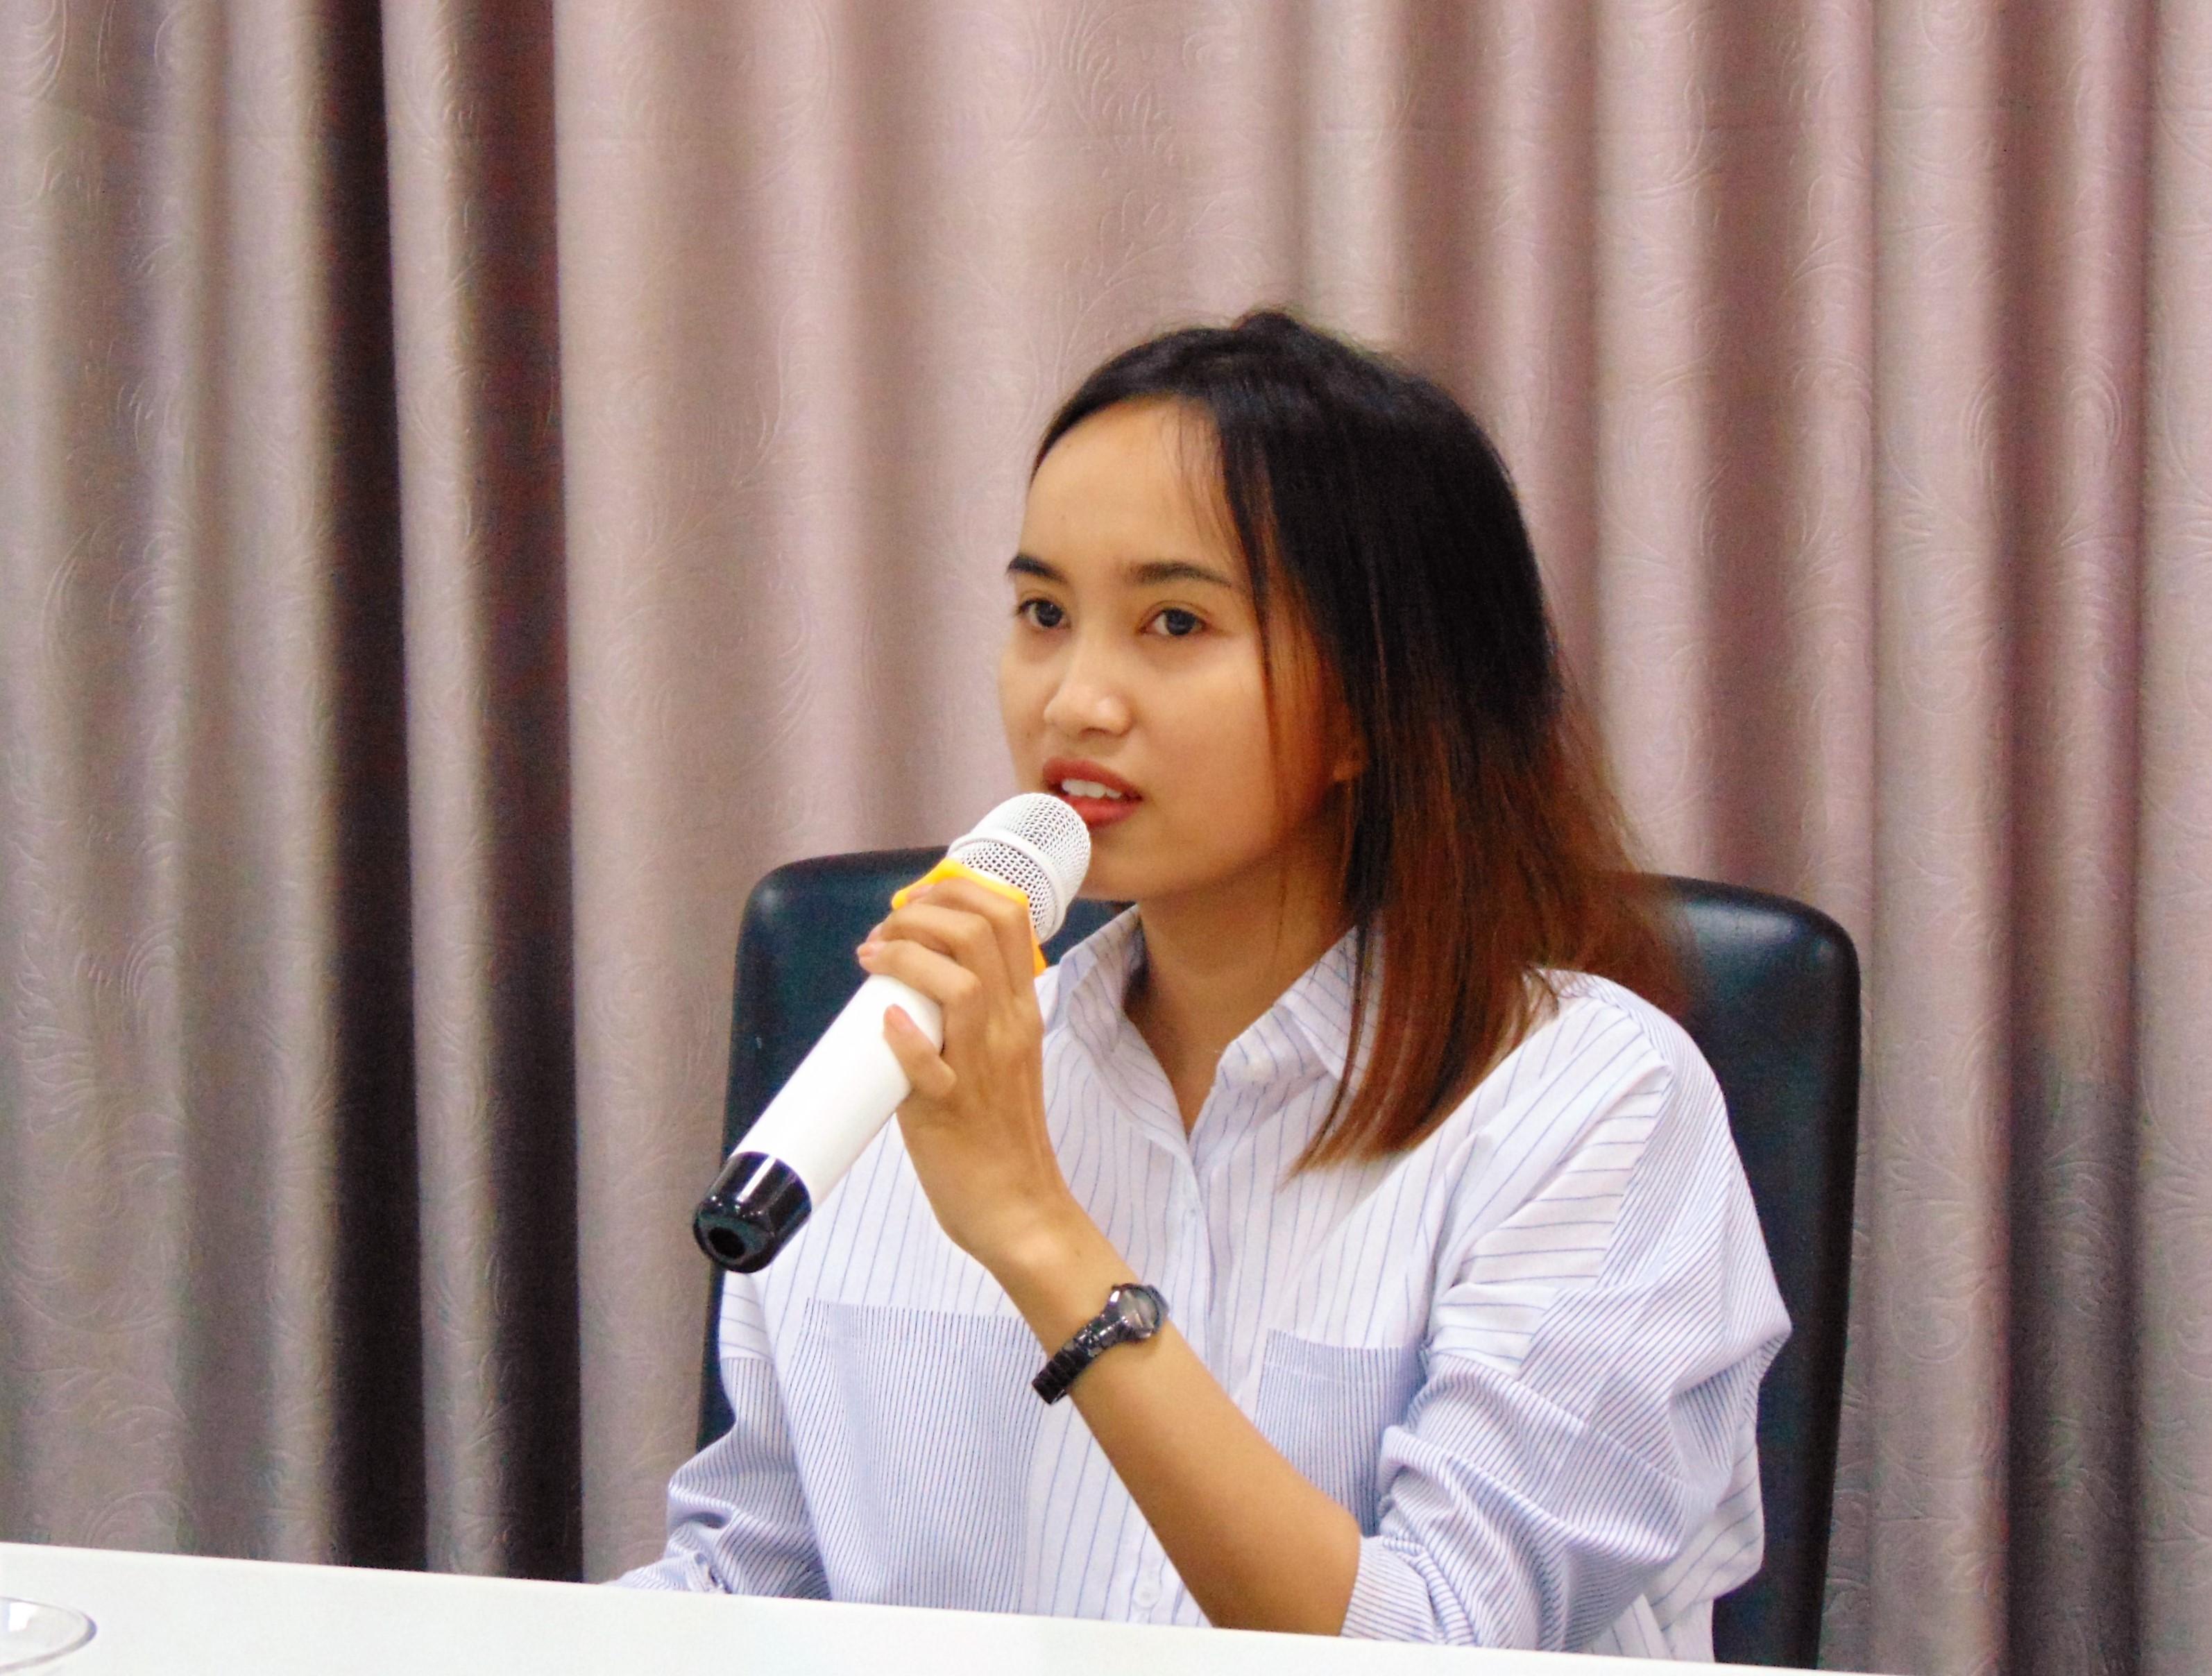 Description: D:\ảnh lớp GDKP hanh phuc\ảnh workshop HP\DSC00018.JPG